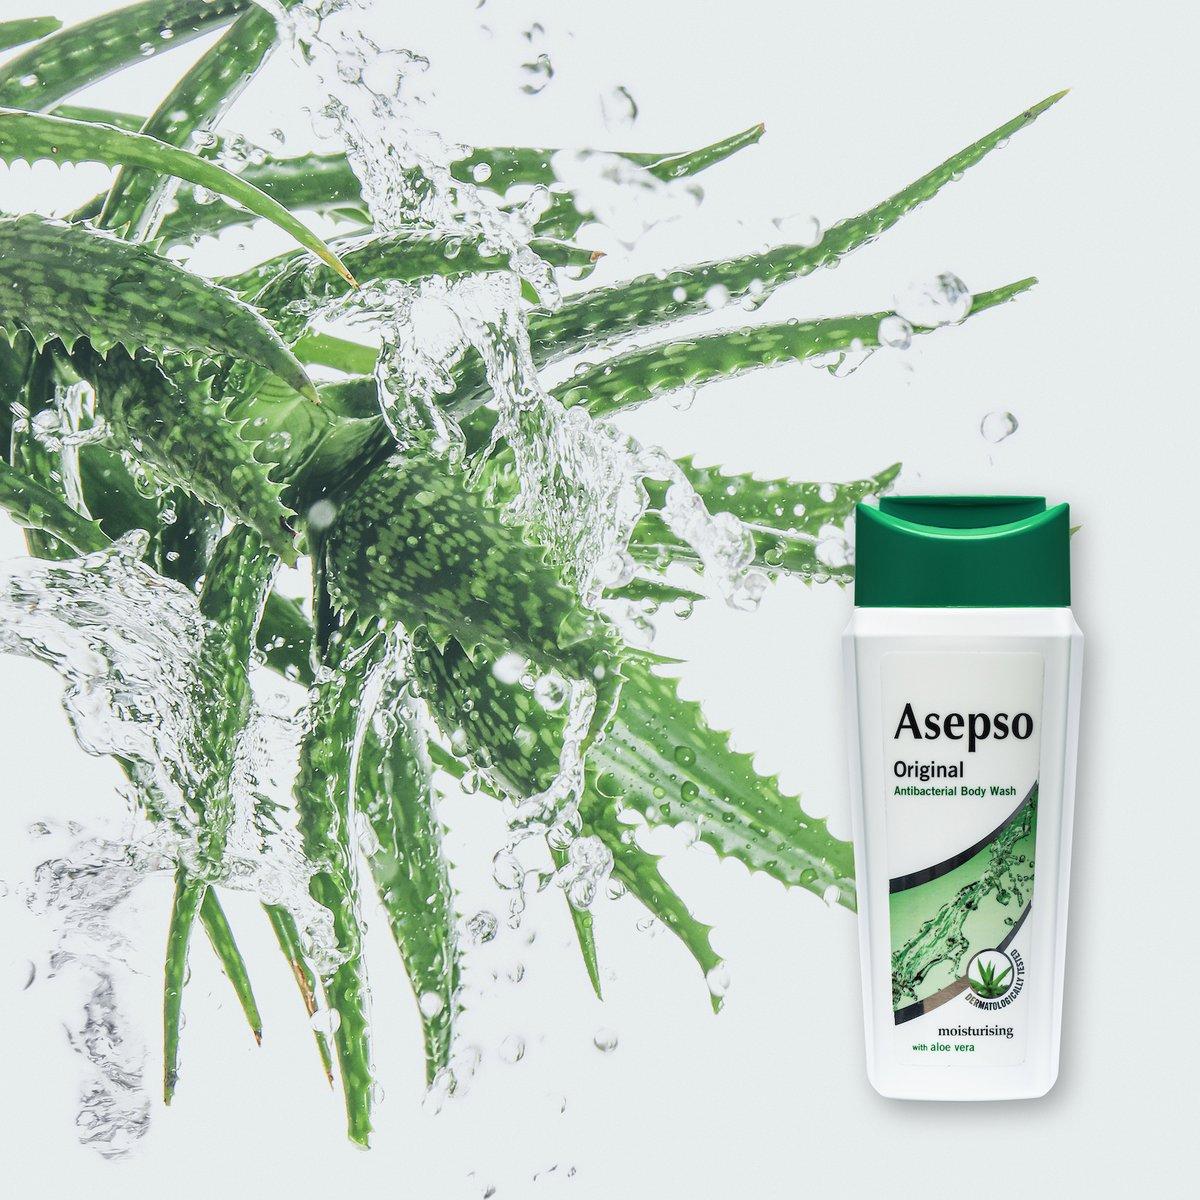 📸 #Asepso Body Wash Original 🚿💚 https://t.co/DHO33W5jTO